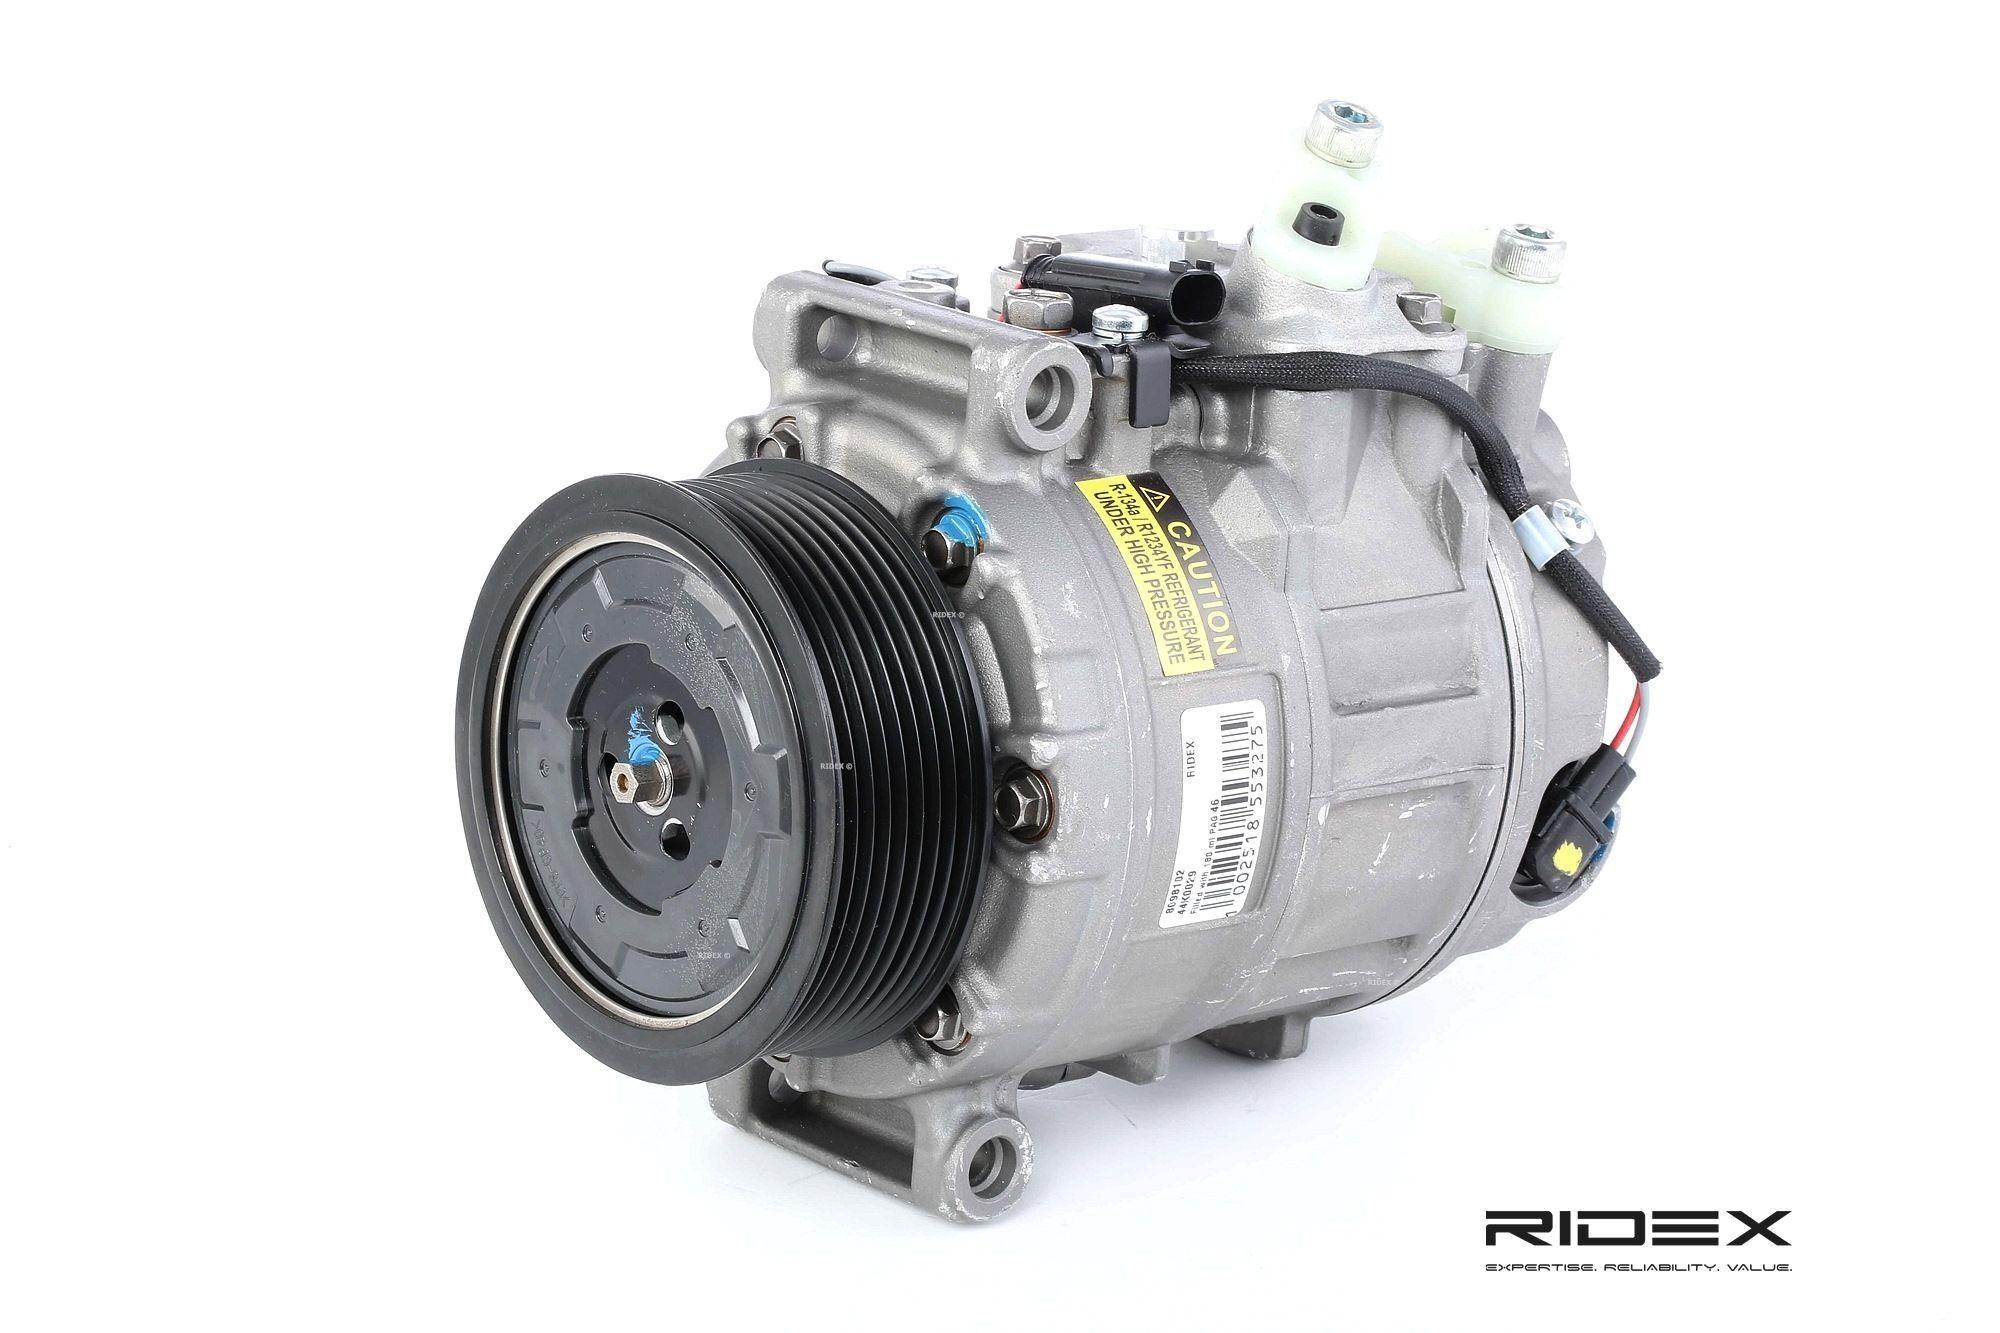 RIDEX Compresseur De Climatisation 447K0029 Compresseur De Clim,Compresseur, climatisation MERCEDES-BENZ,CLASE M W164,CLASE R W251, V251,CLASE S W221